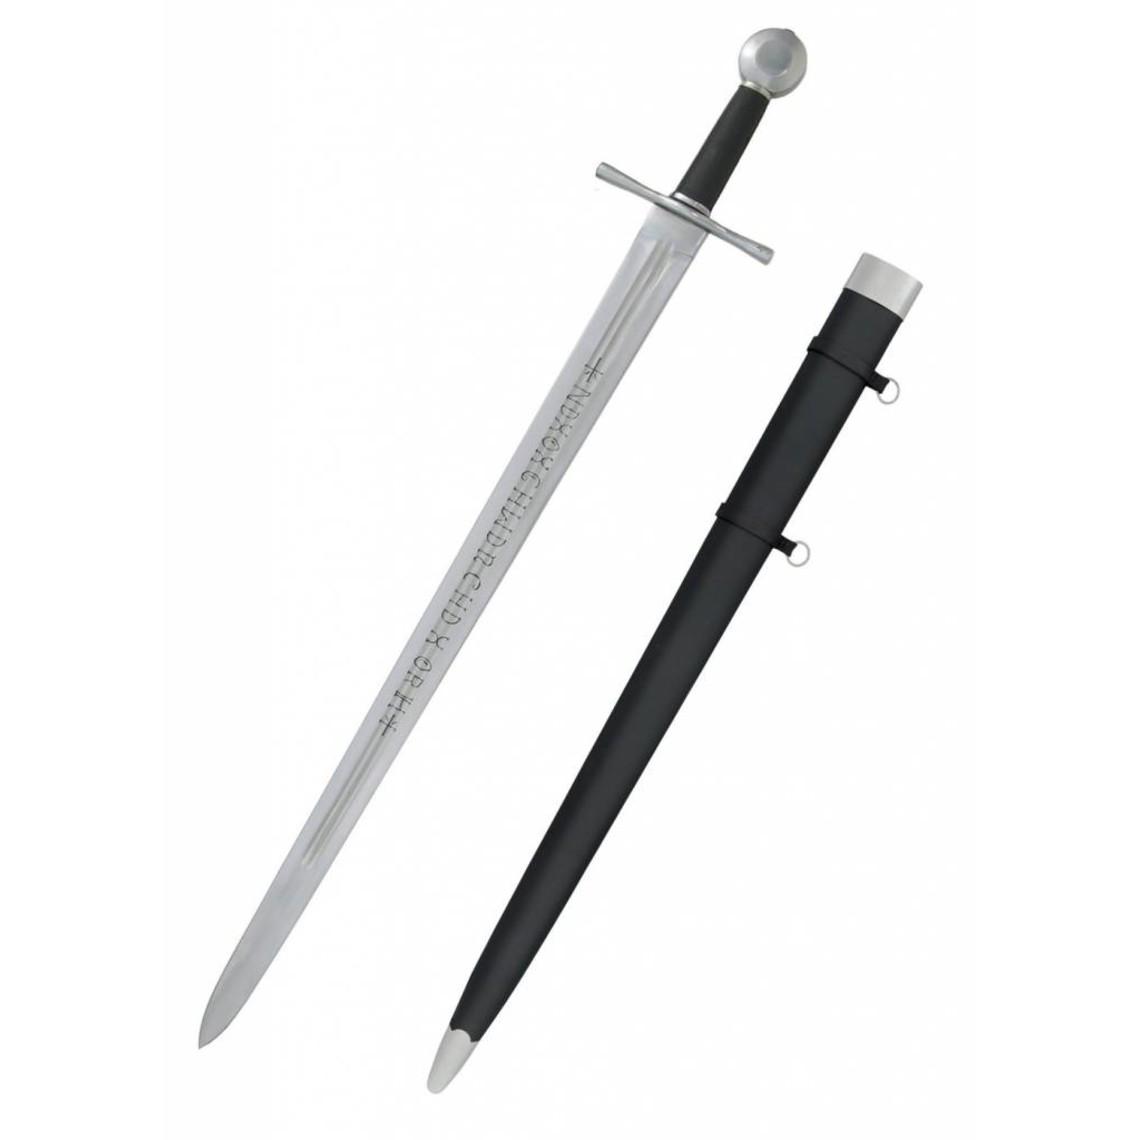 CAS Hanwei espada río Witham